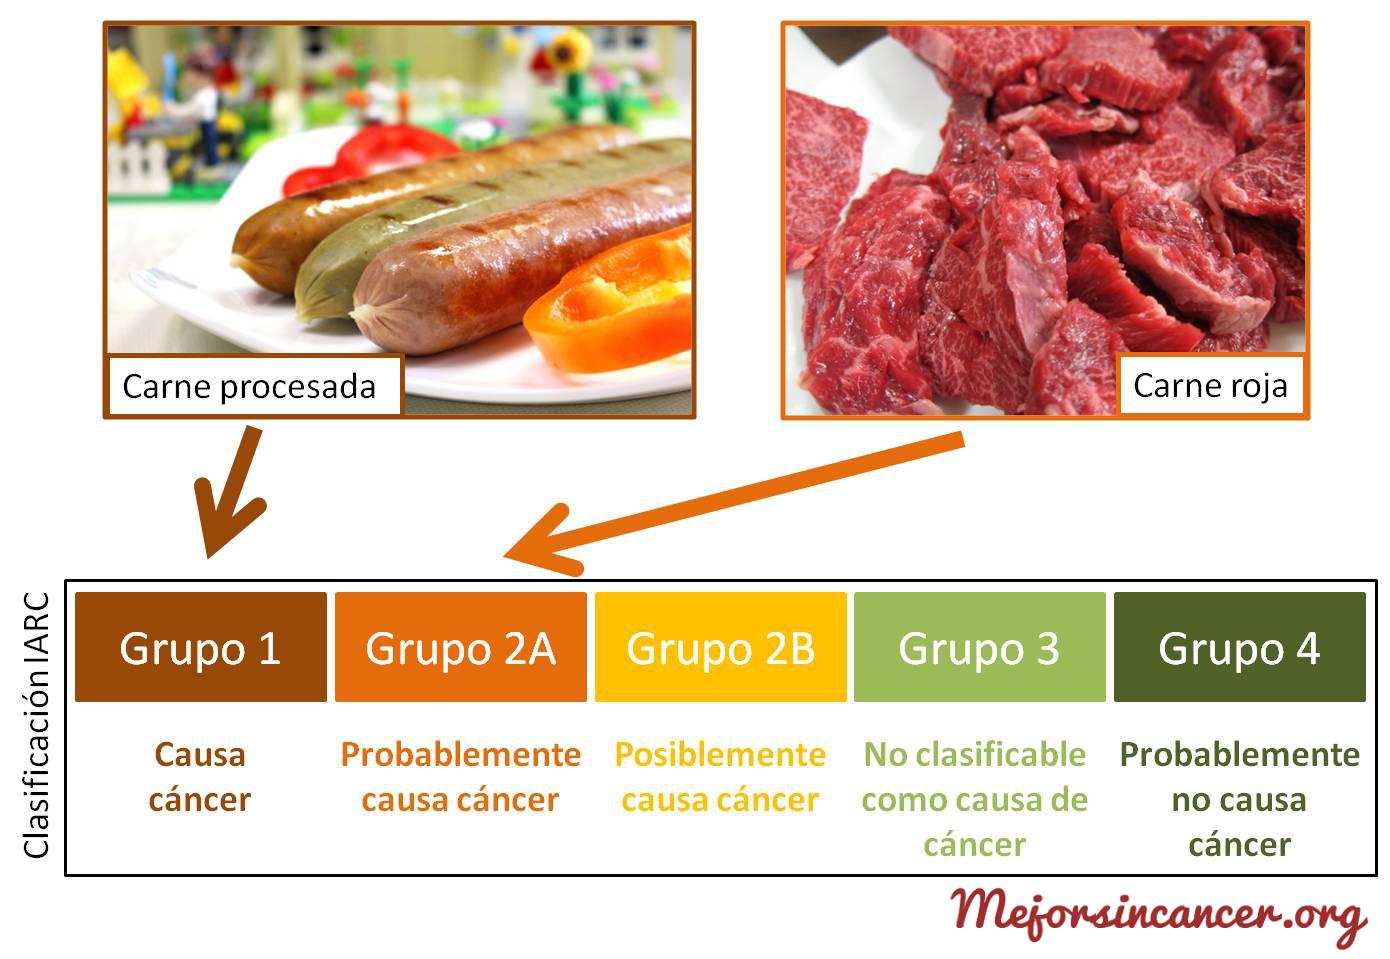 carne_cancer_clasificacion_iarc